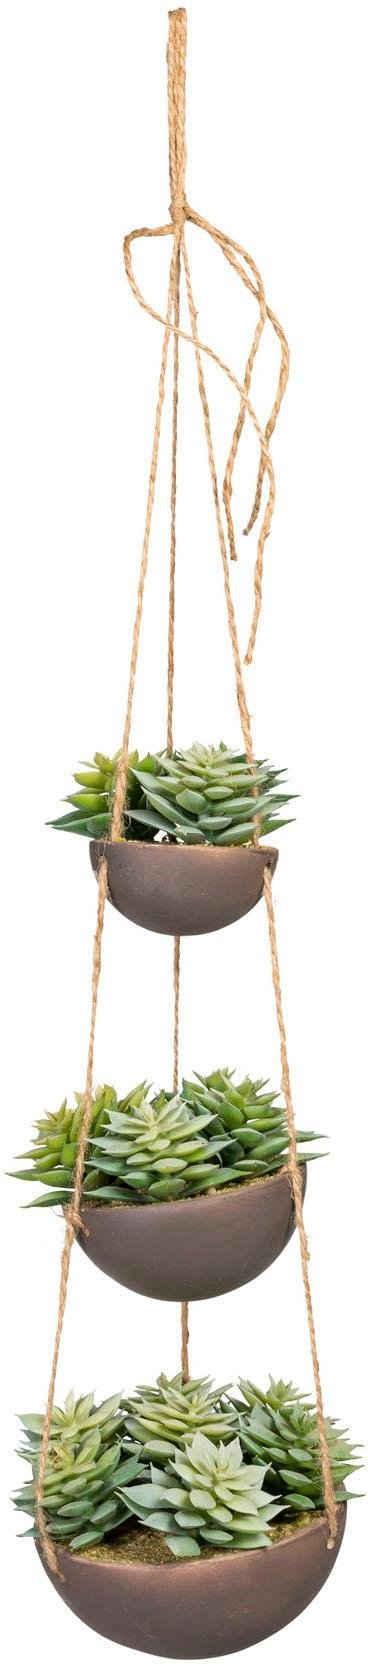 Kunstpflanze »Sukkulenten«, Creativ green, Höhe 40 cm